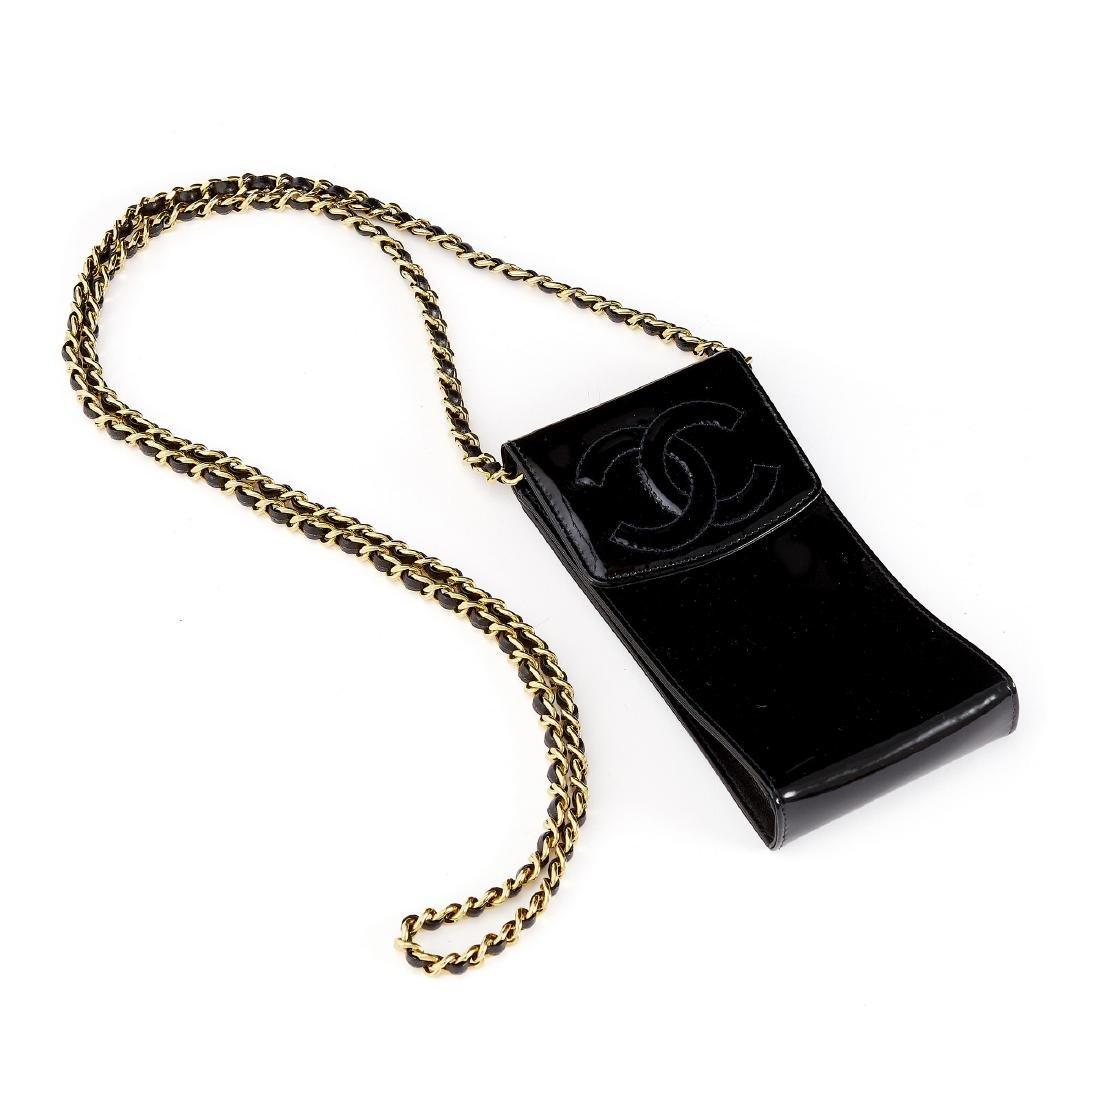 Chanel Crossbody Phone Bag